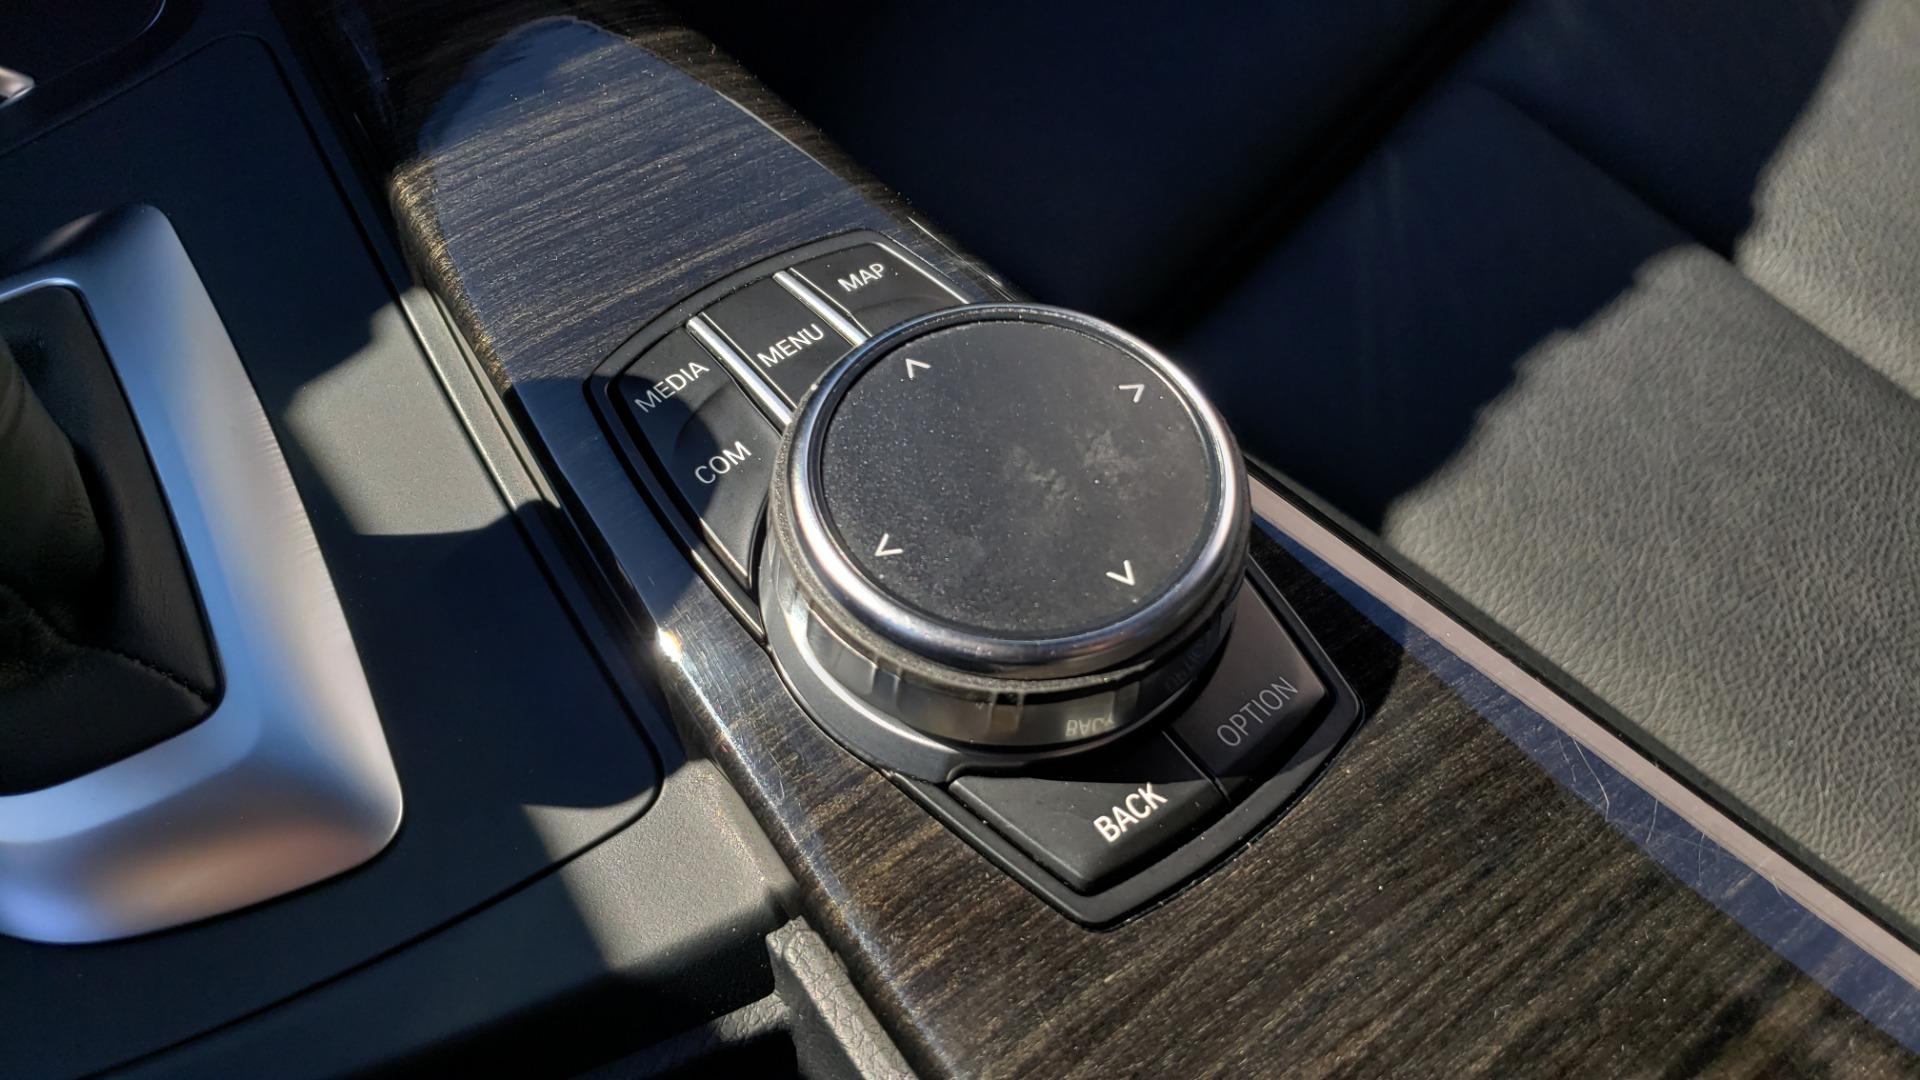 Used 2018 BMW 4 SERIES 430IXDRIVE / PREMIUM / NAV / SUNROOF / ESSENTIALS PKG for sale $29,495 at Formula Imports in Charlotte NC 28227 48